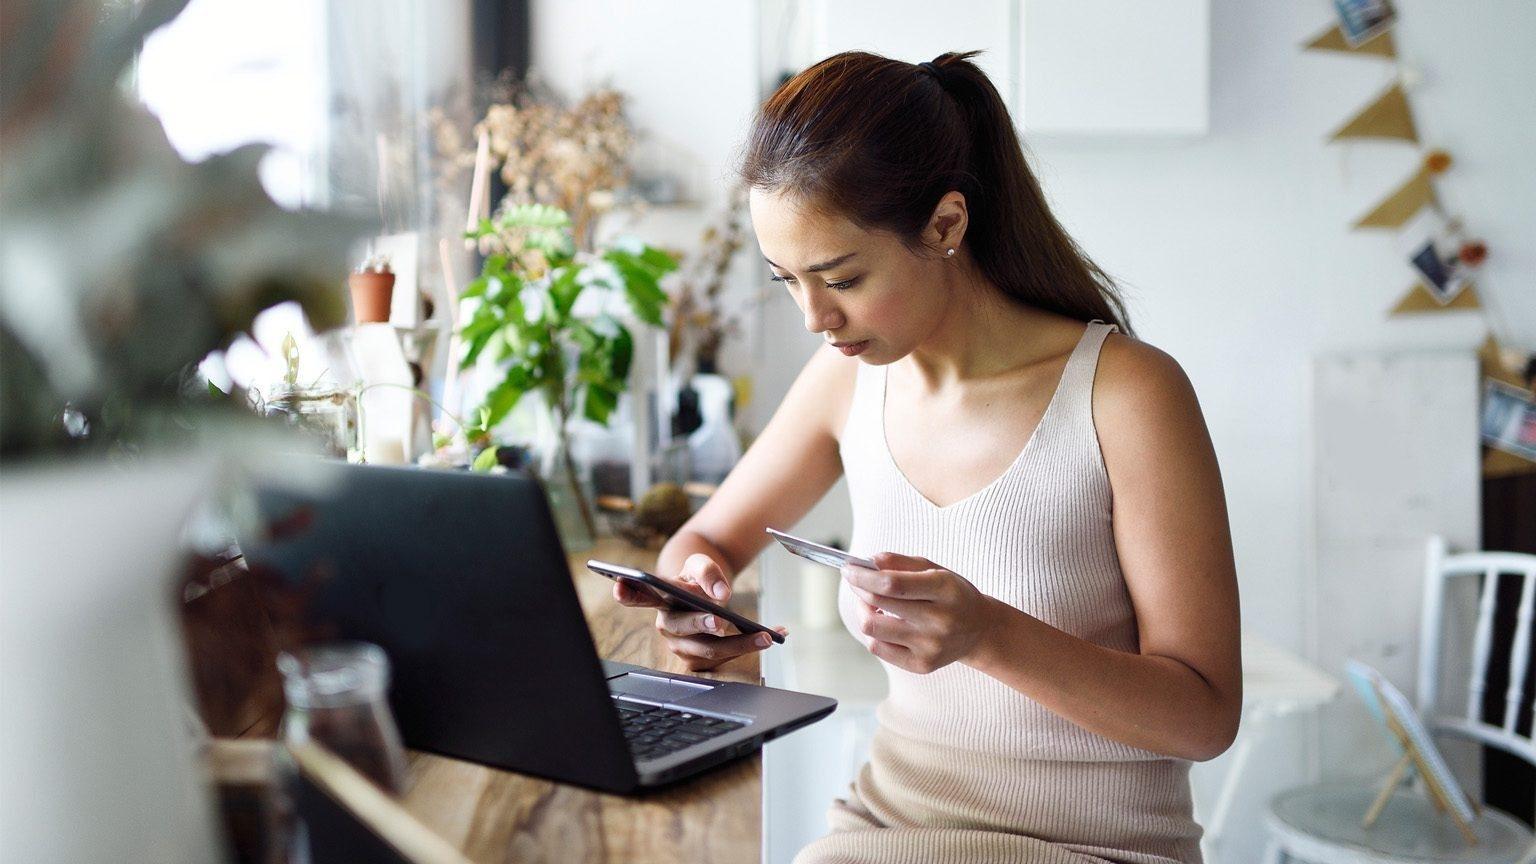 Girl Debit Card With Laptop